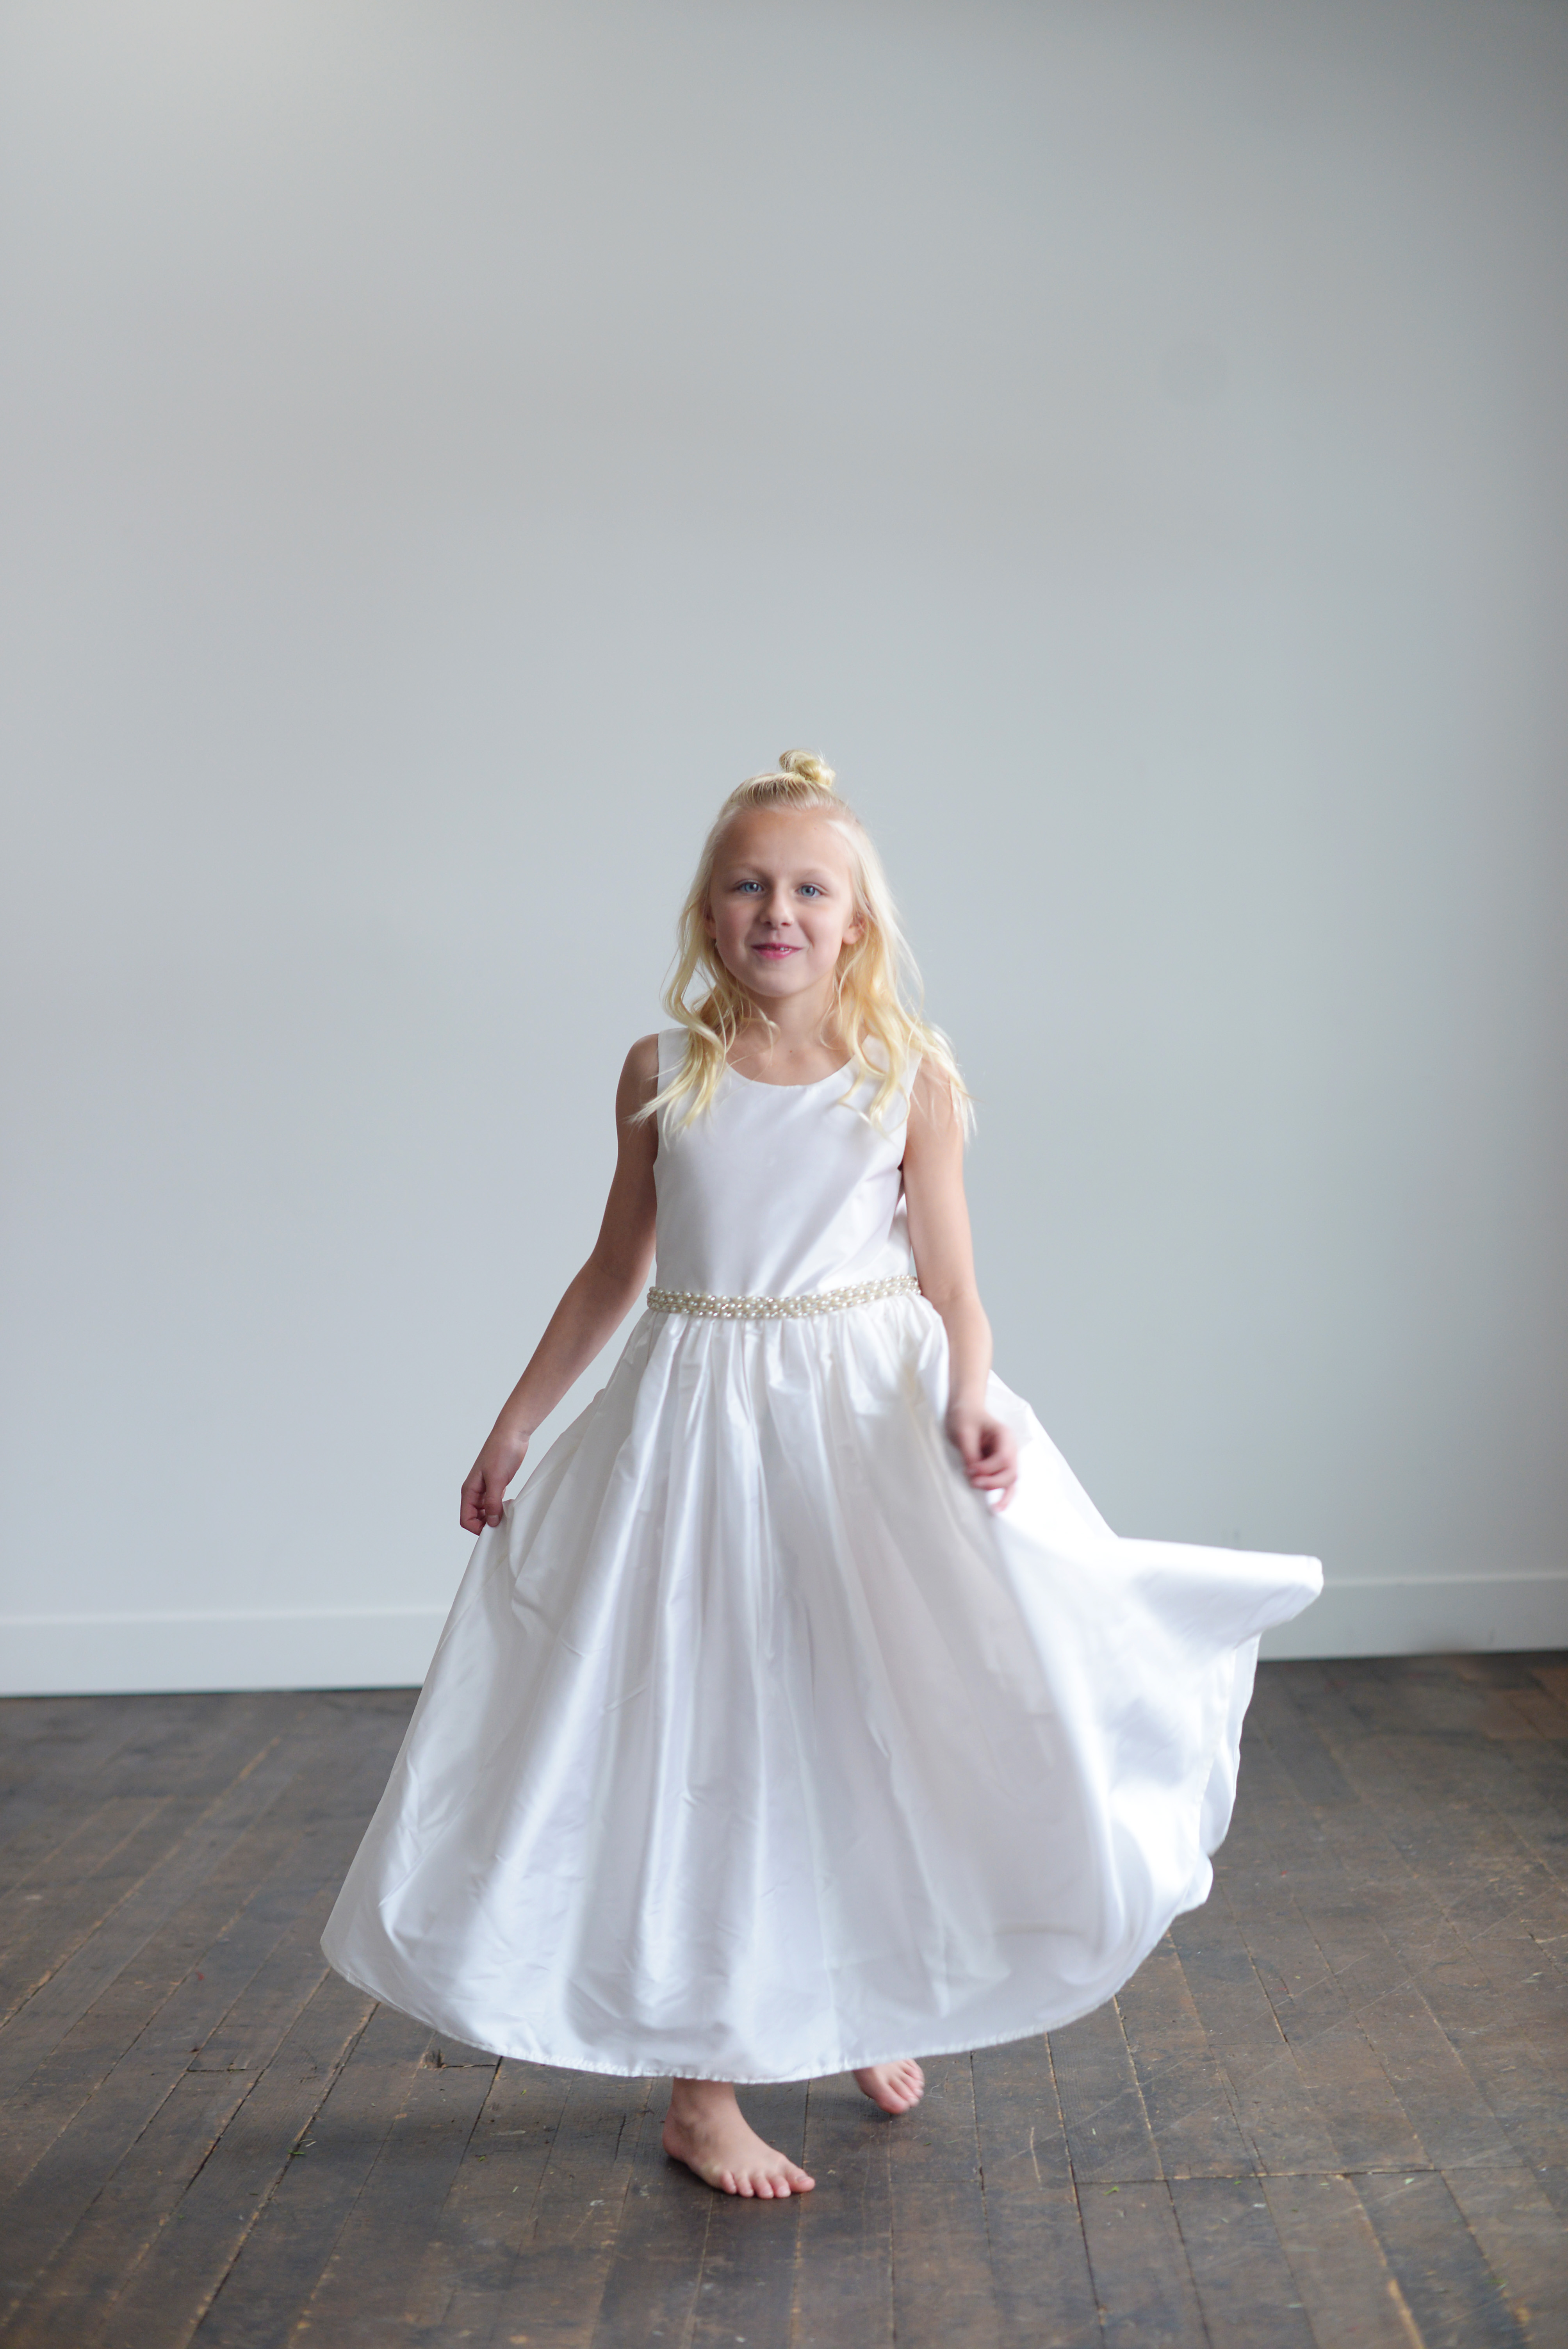 Handmade And Bespoke Flower Girl Dresses And Communion Dresses Made